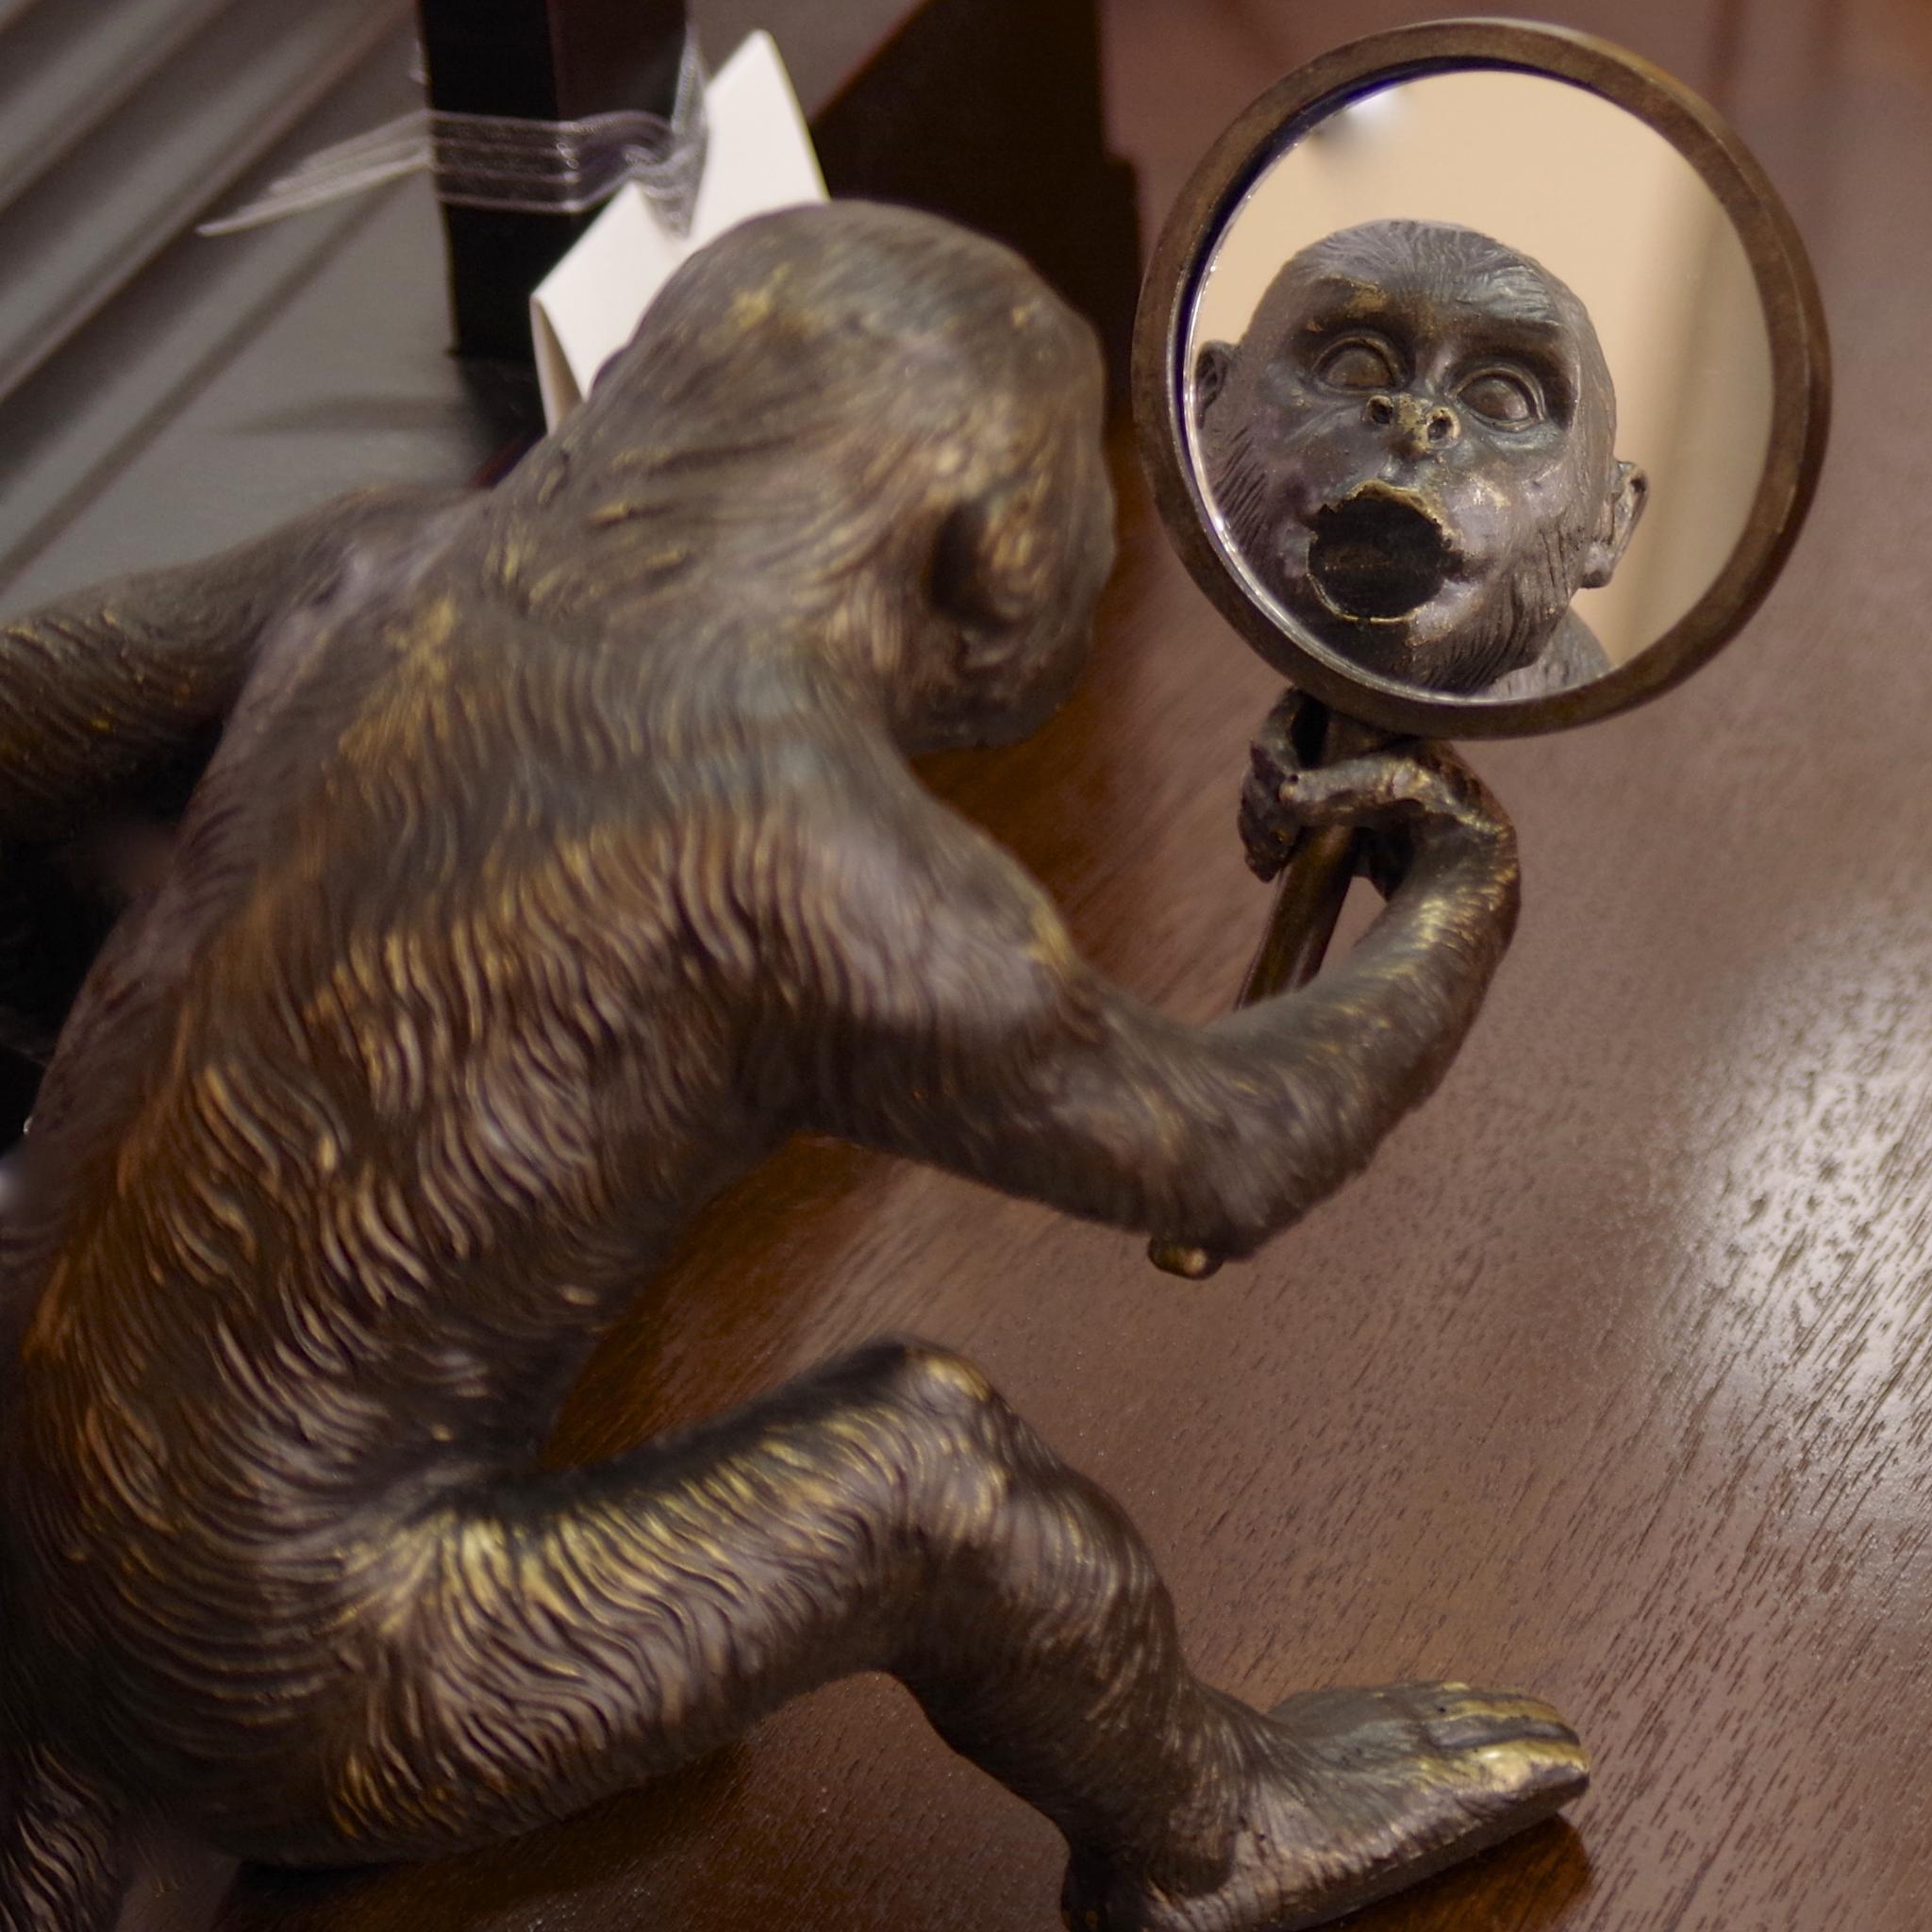 Monkey in the Mirror by cee.lewars